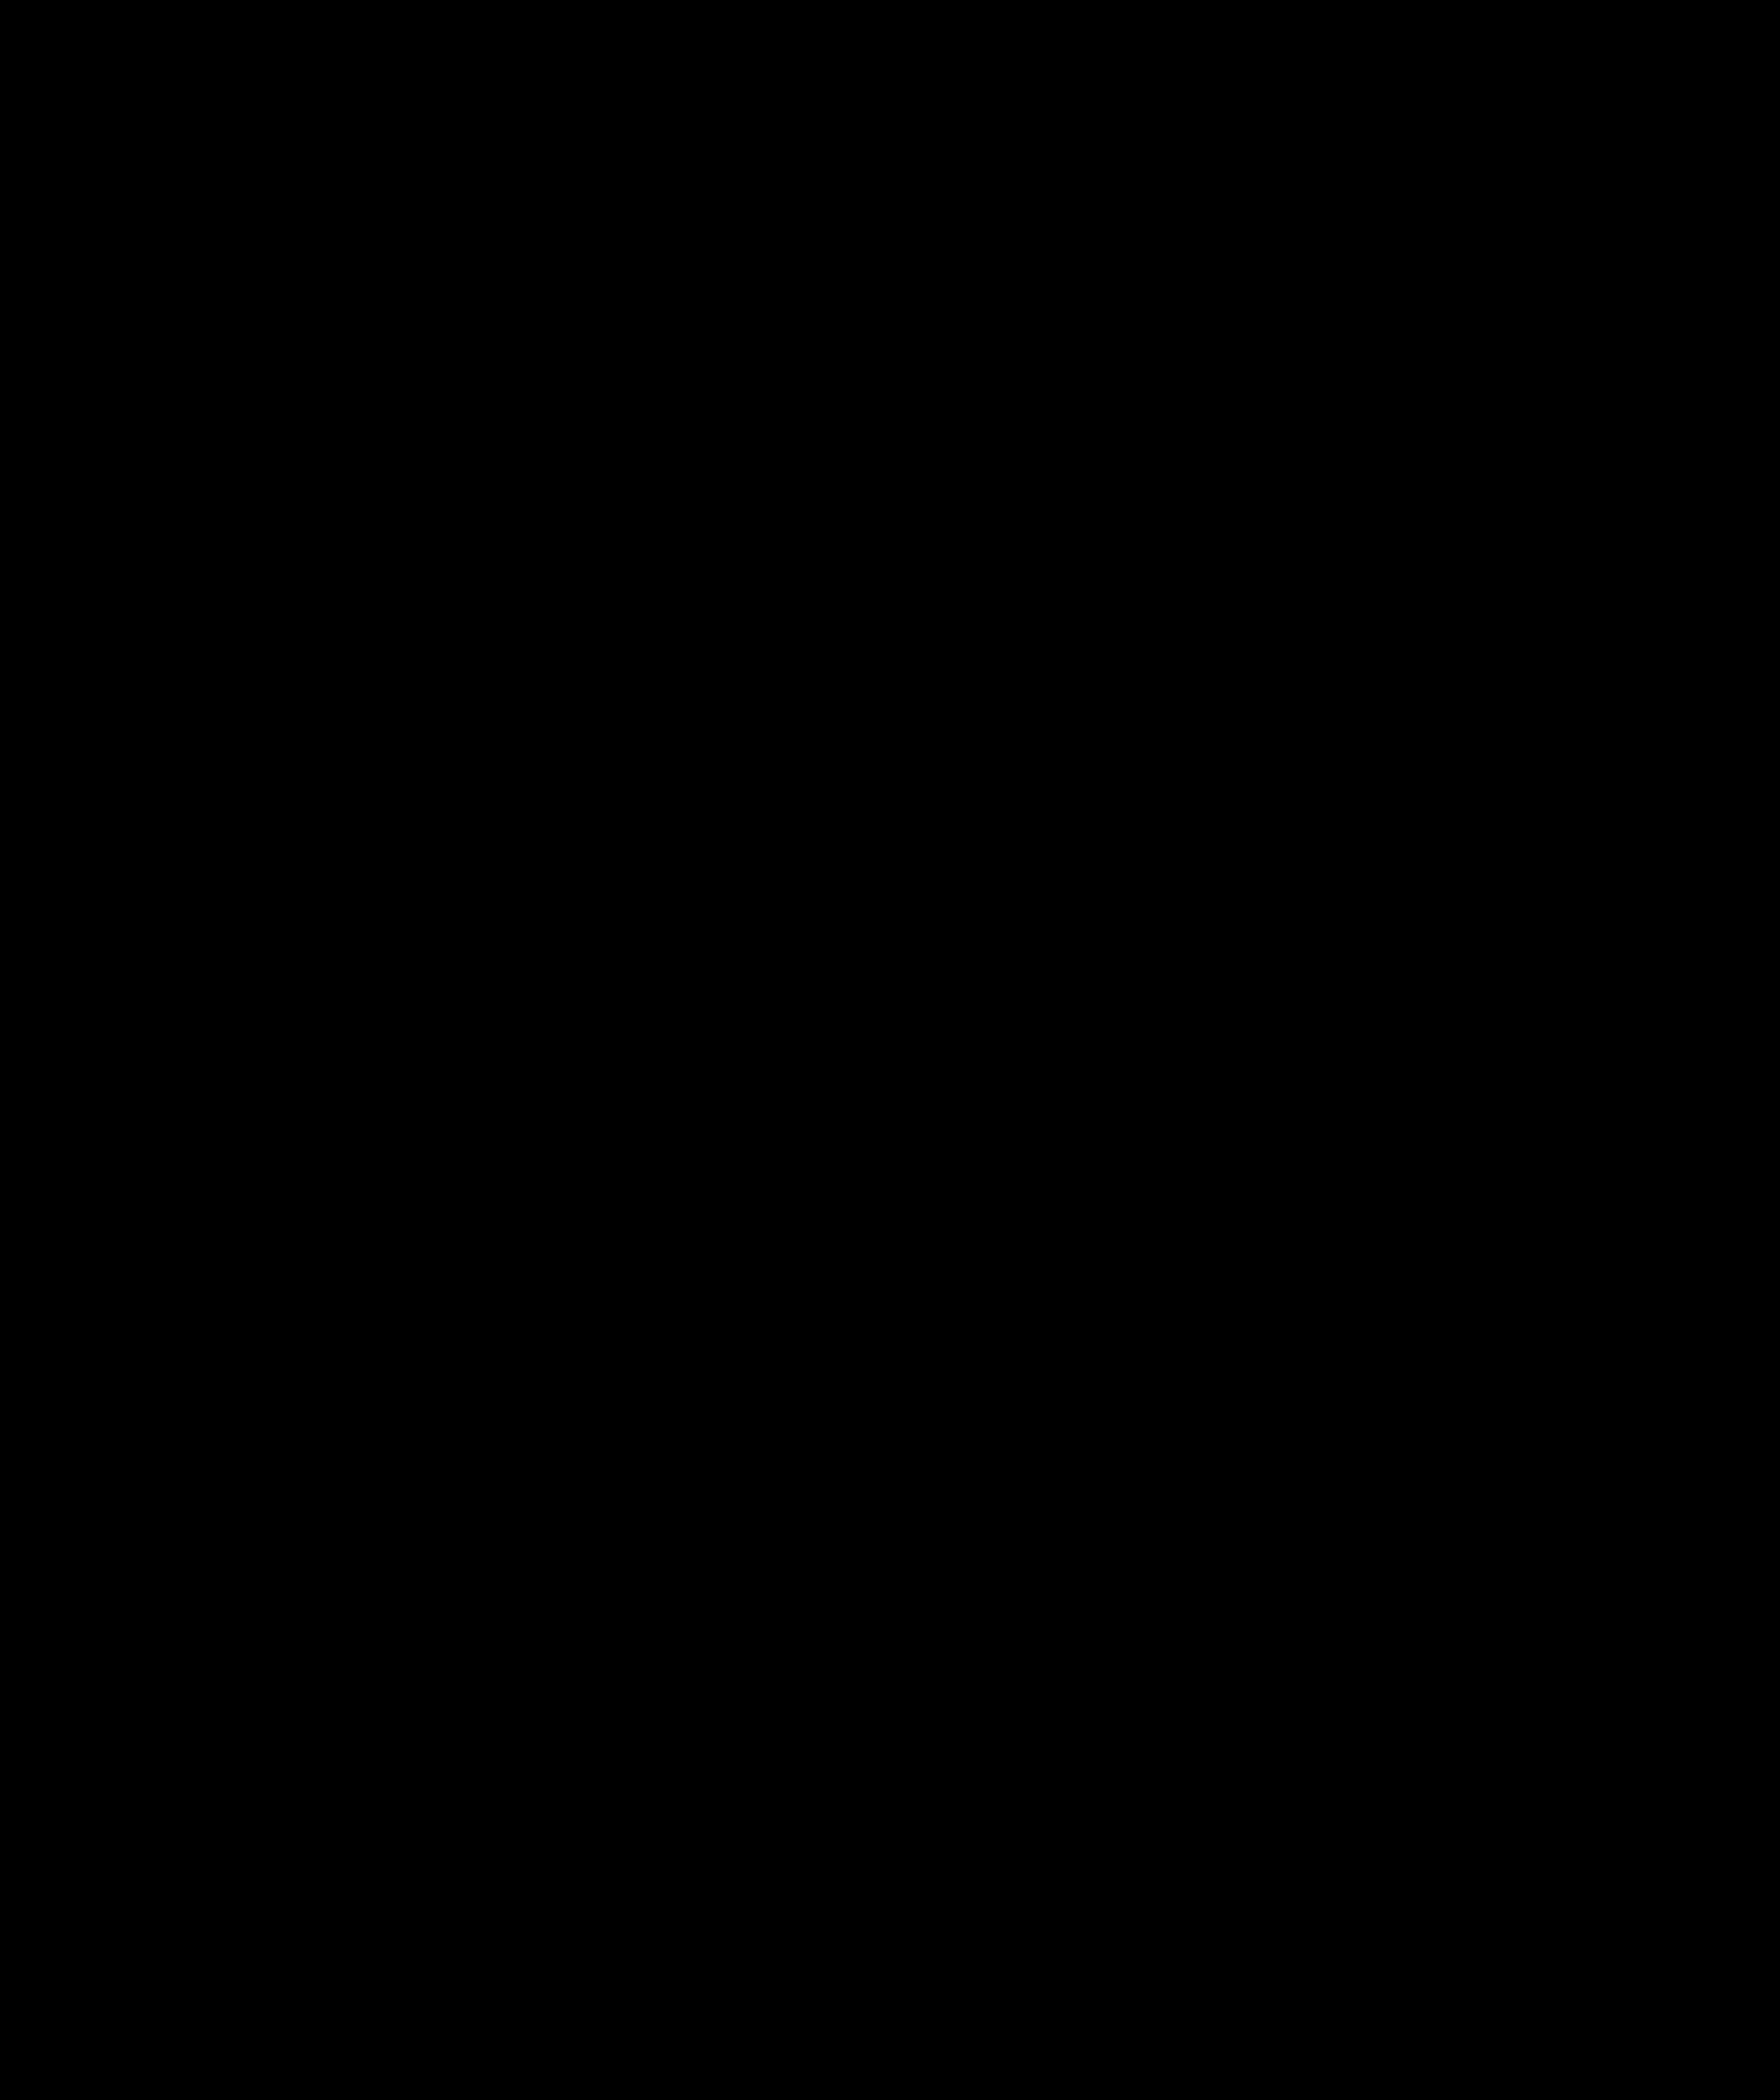 2016x2400 Nursing Symbol Clip Art Clipart Panda